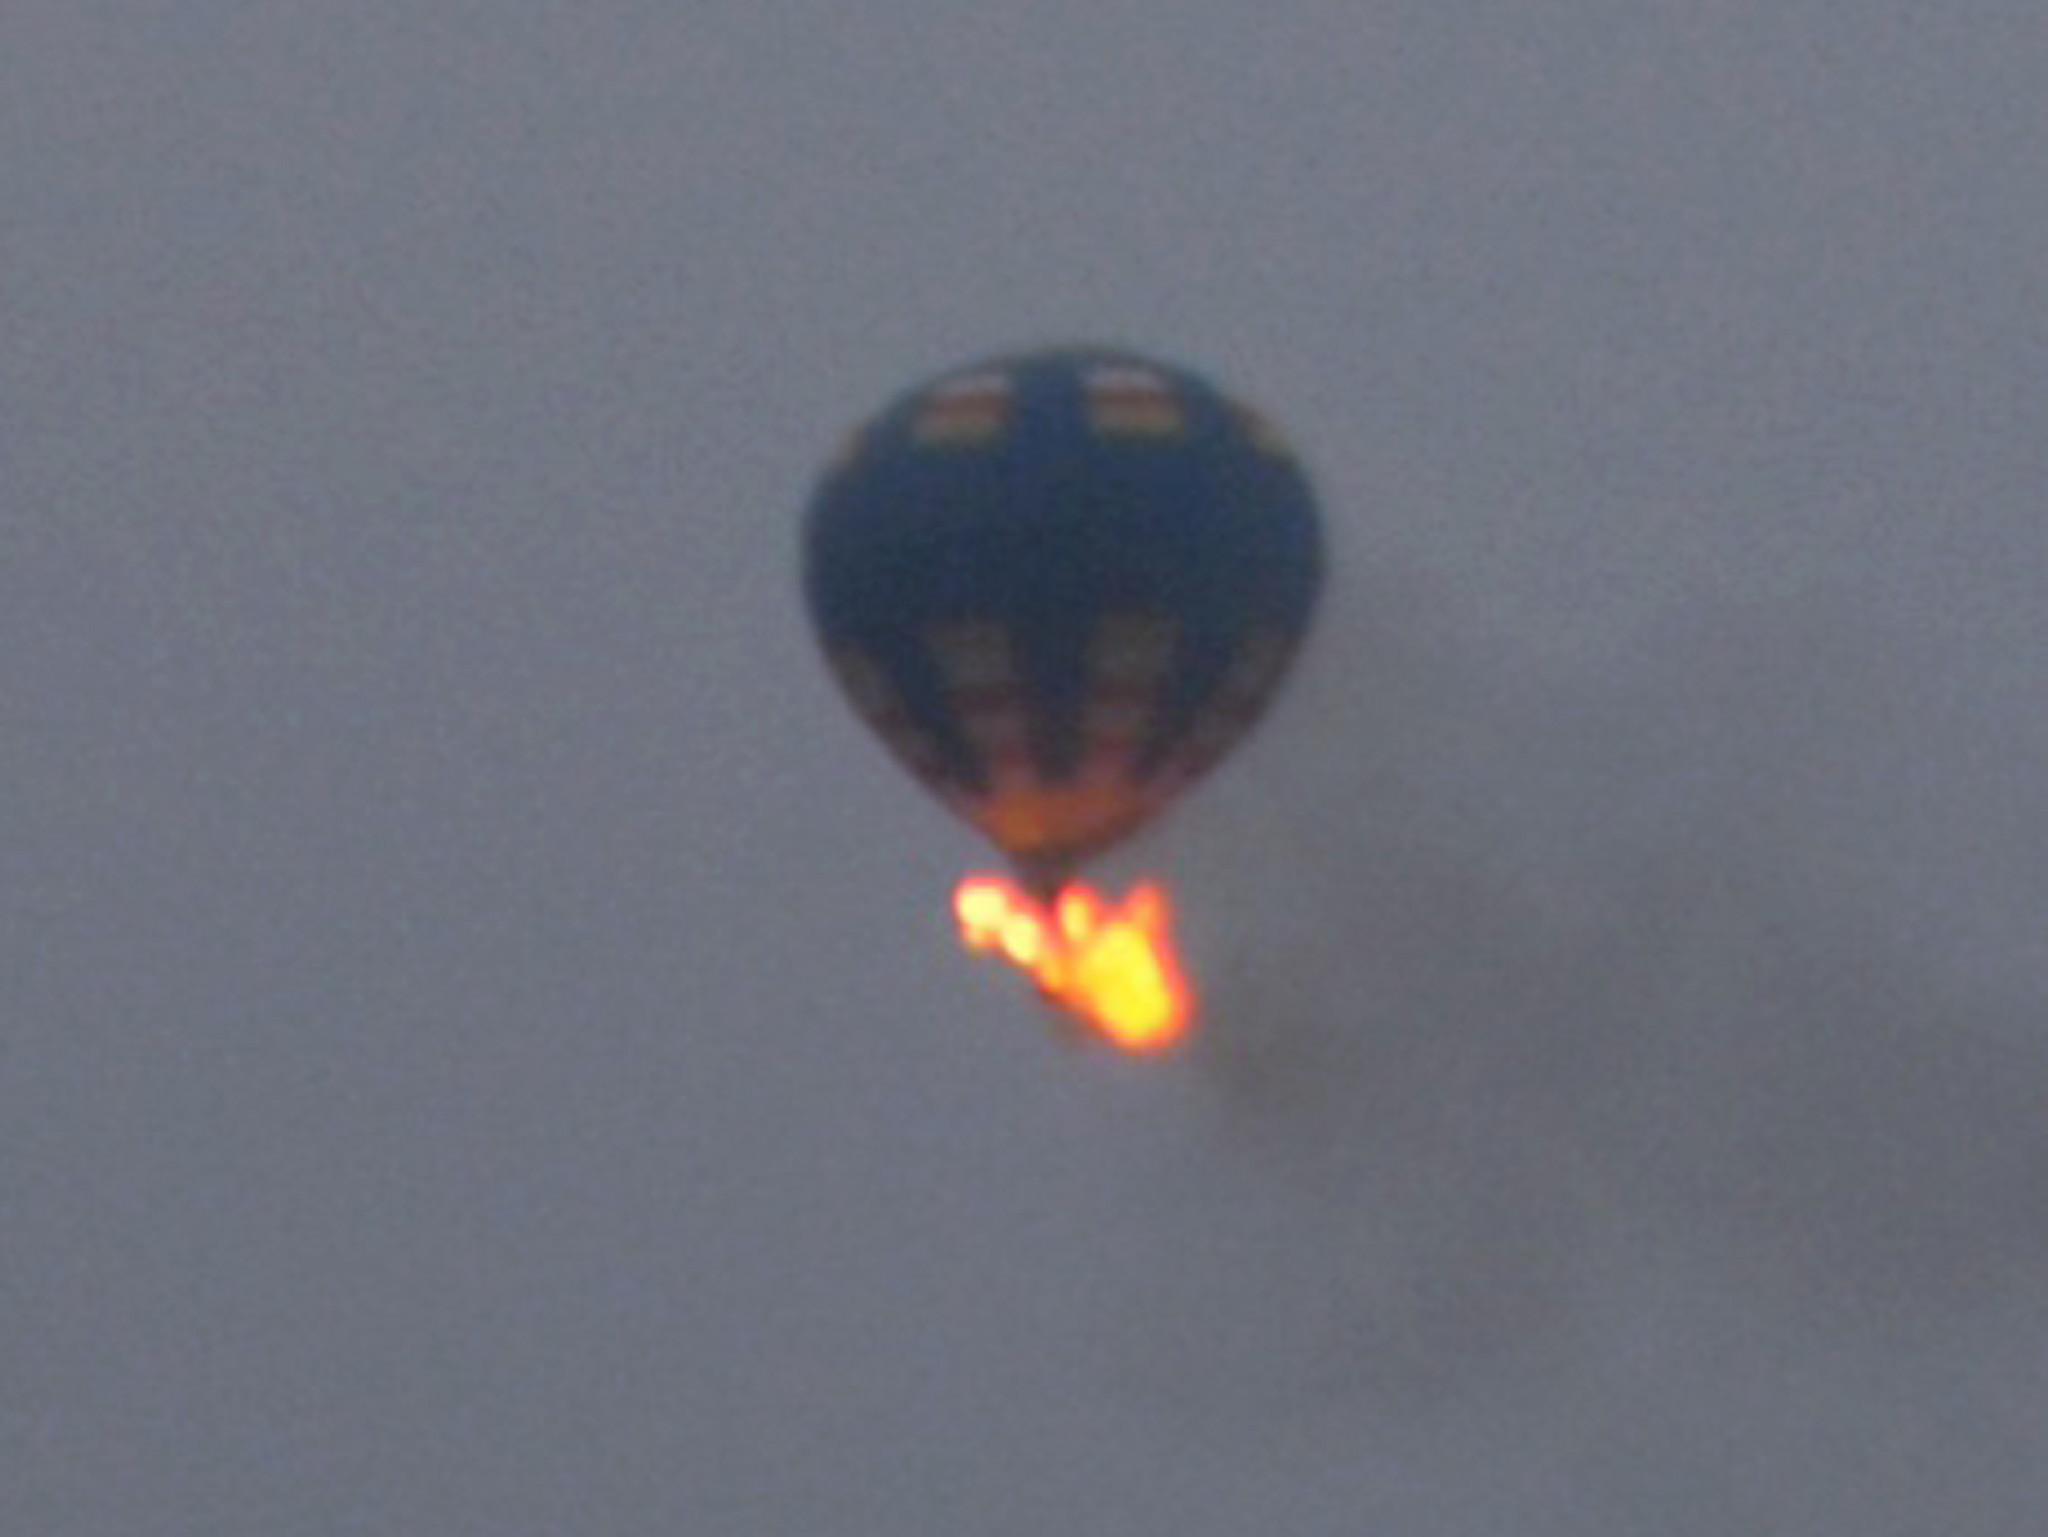 deadly air balloon crash comes amid growing safety concern